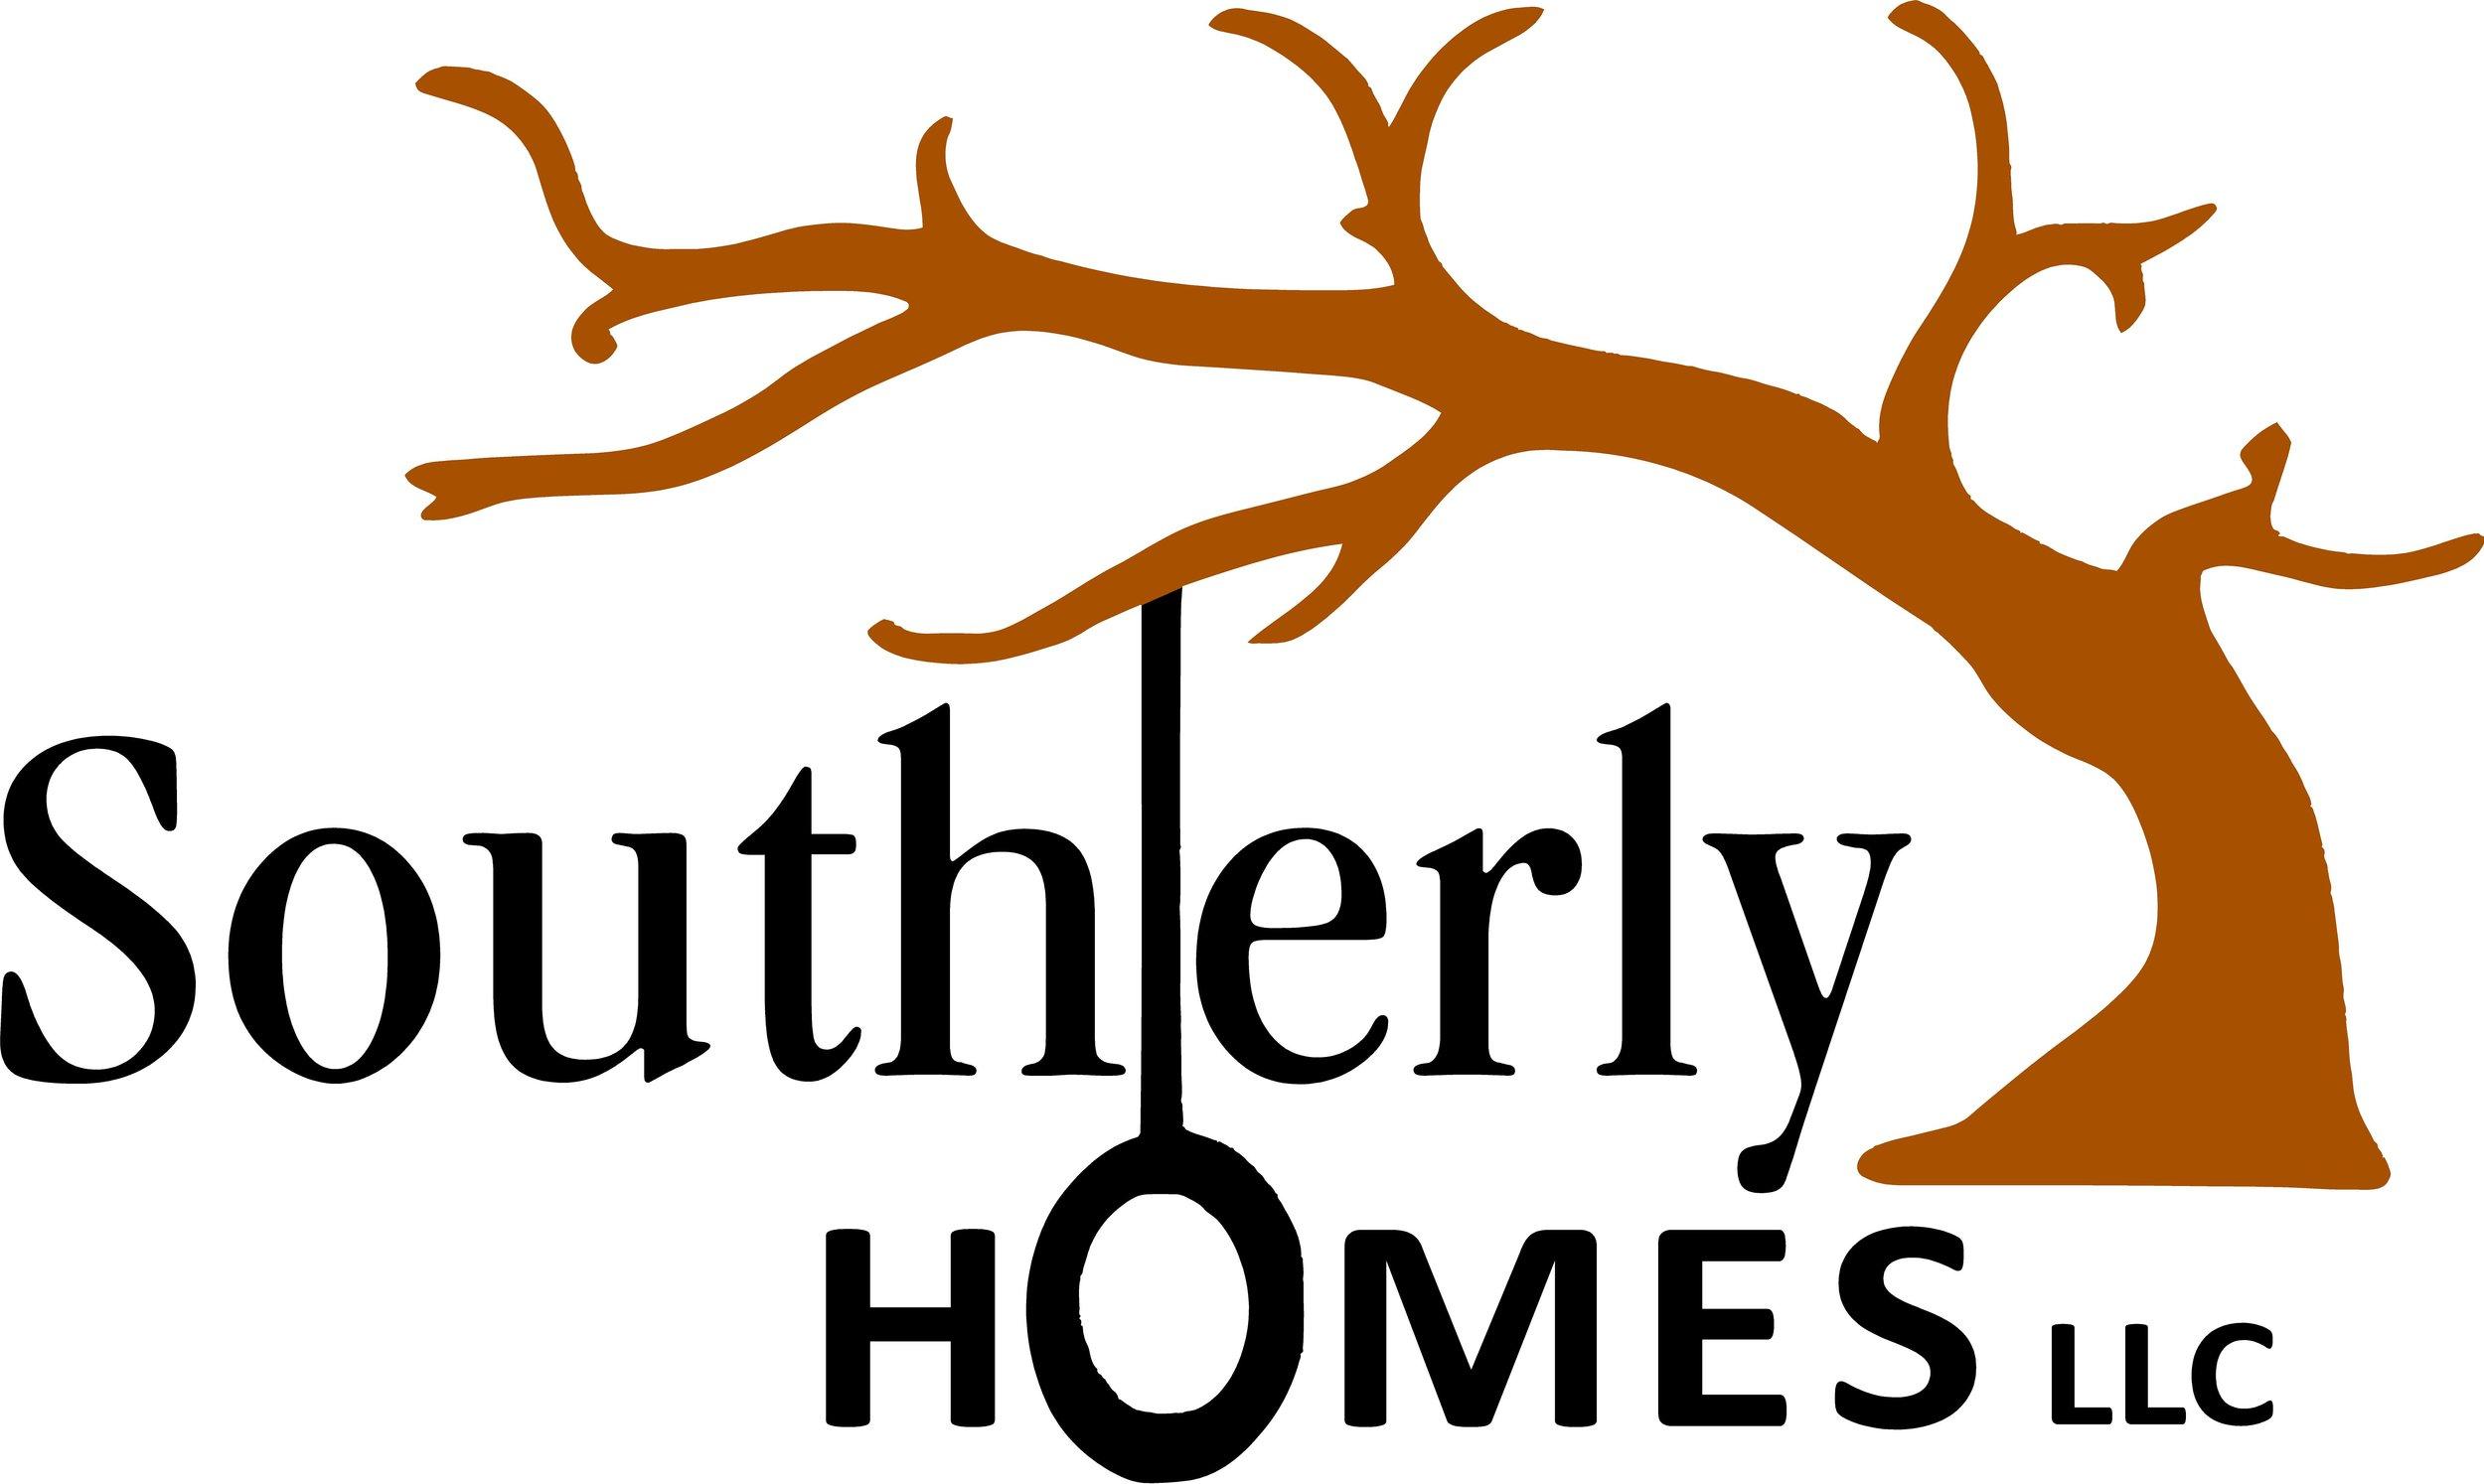 SOUTHERLY HOMES 24X18 6.13.17.jpg